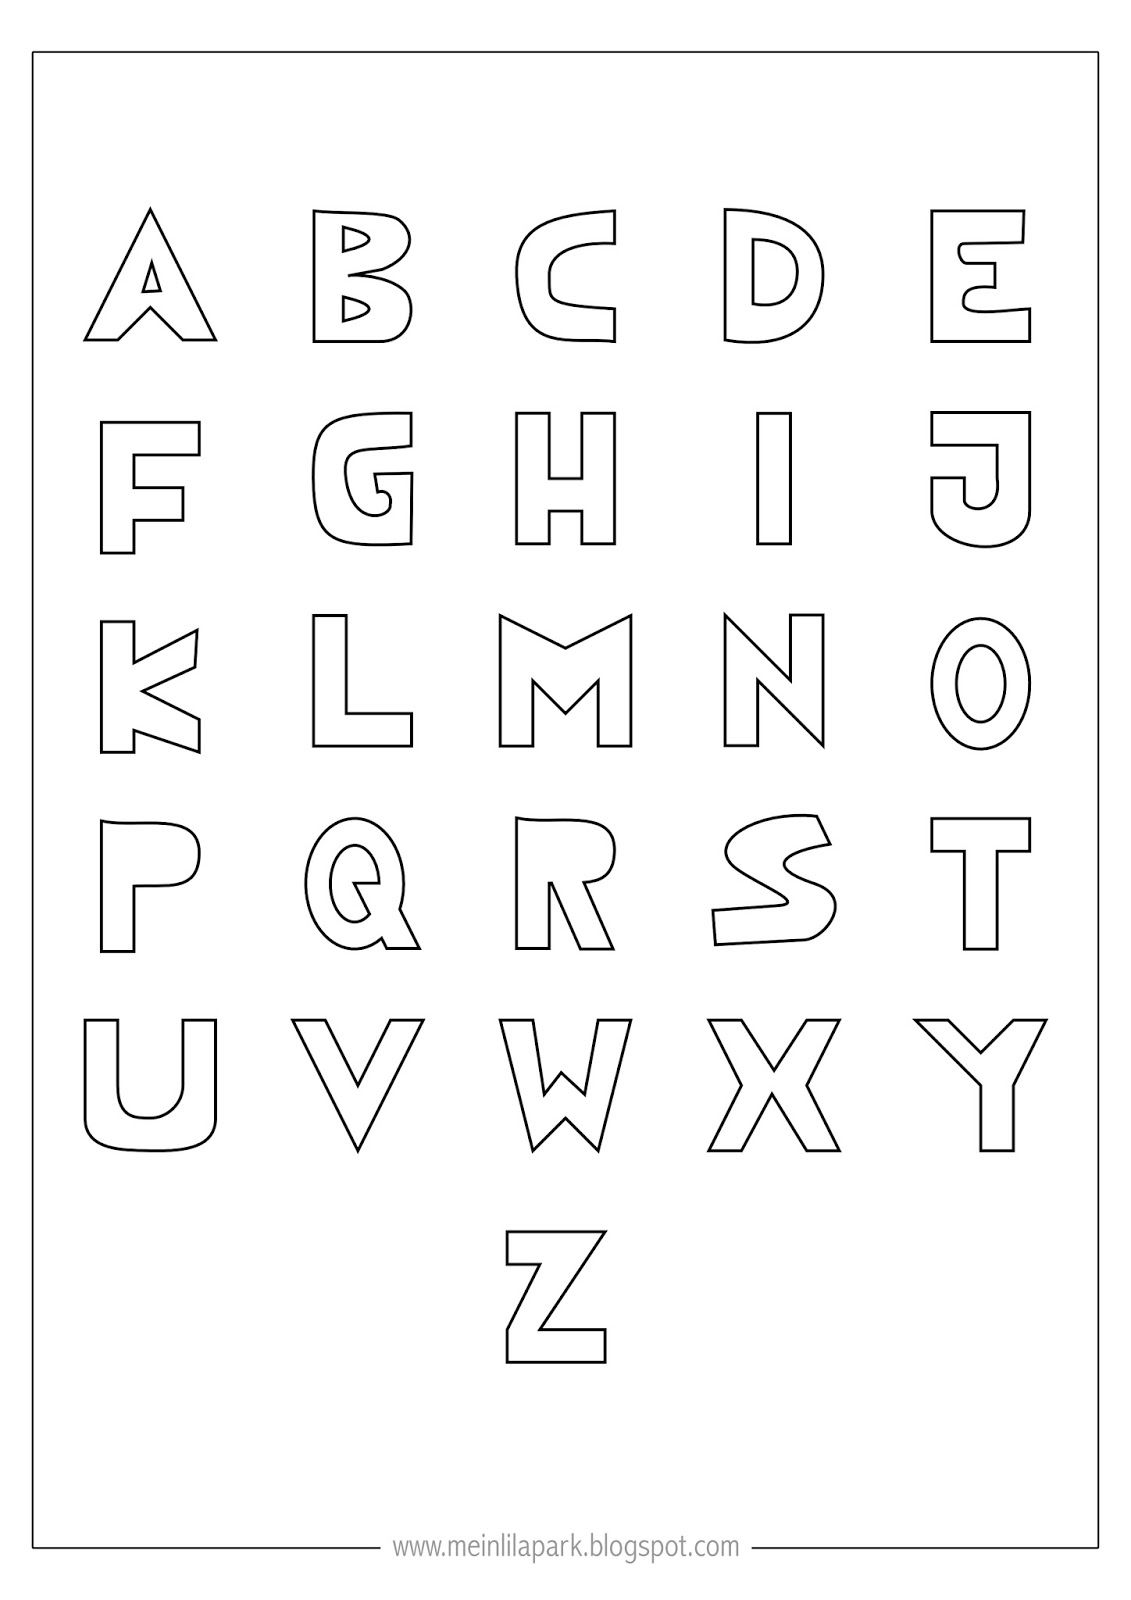 Free printable alphabet letter template coloringalphabet free printable alphabet letter template coloringalphabet spiritdancerdesigns Image collections